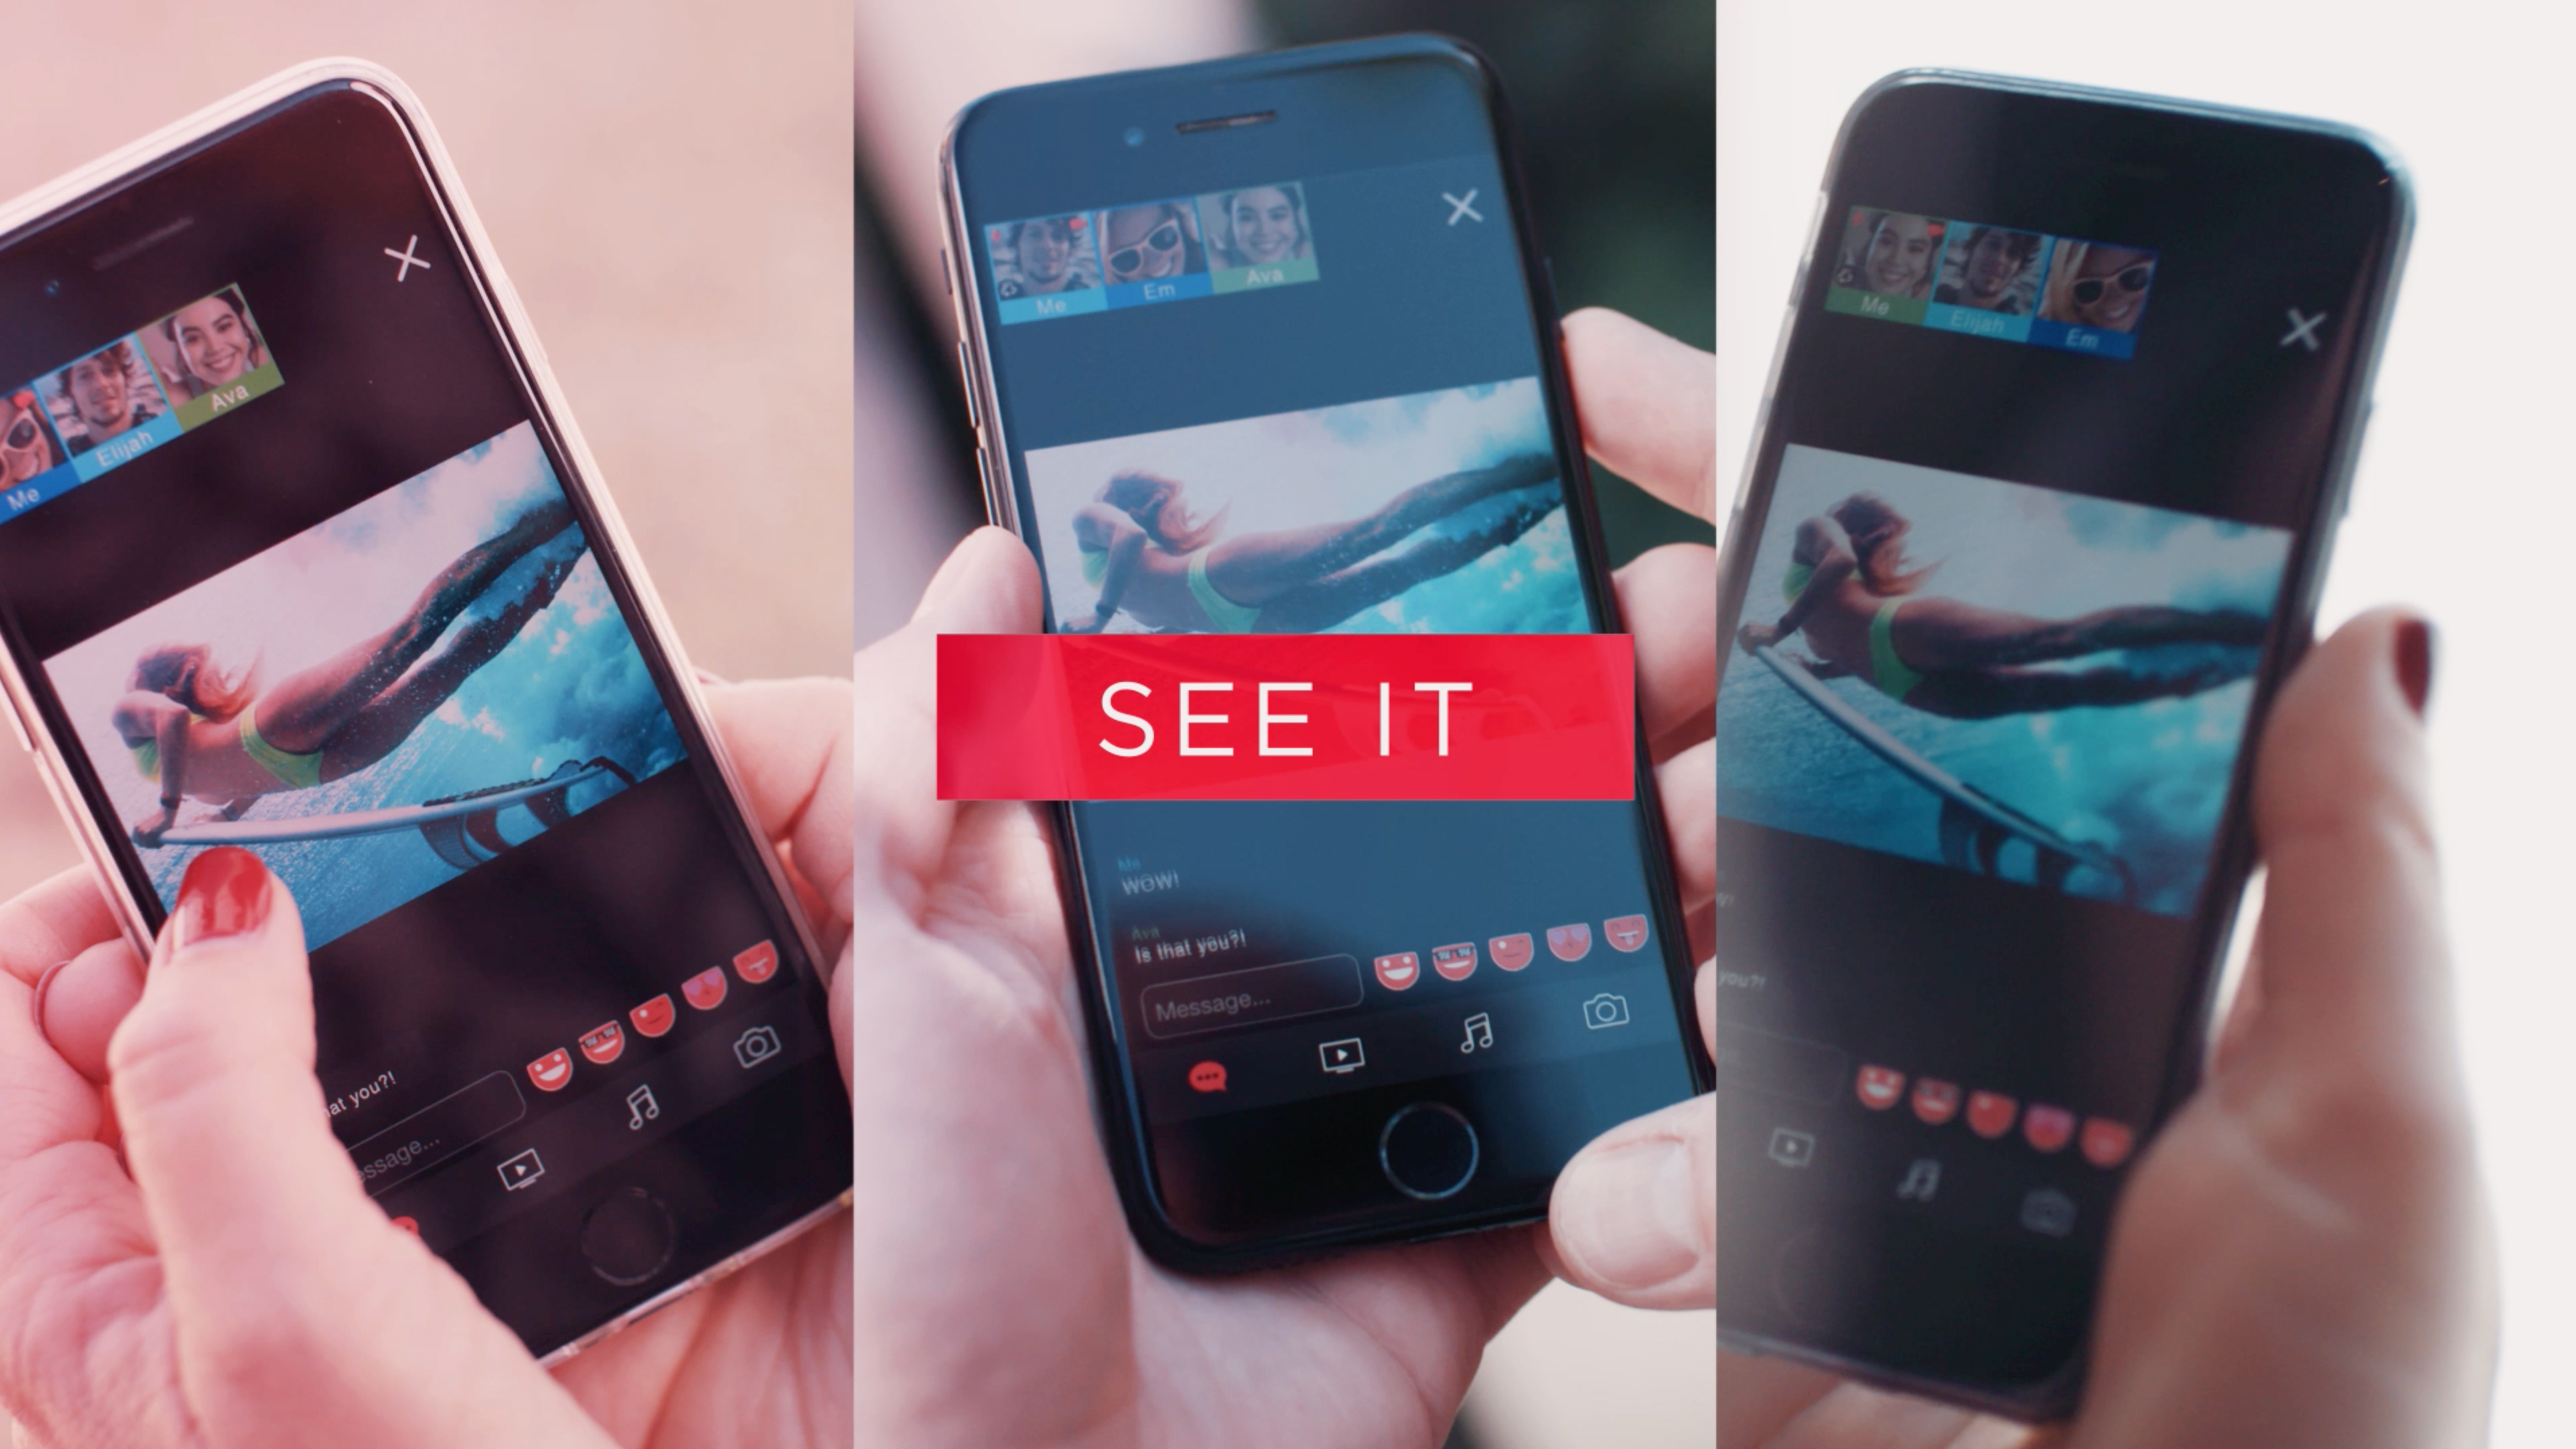 Dabkick video stills, people using application on smartphone